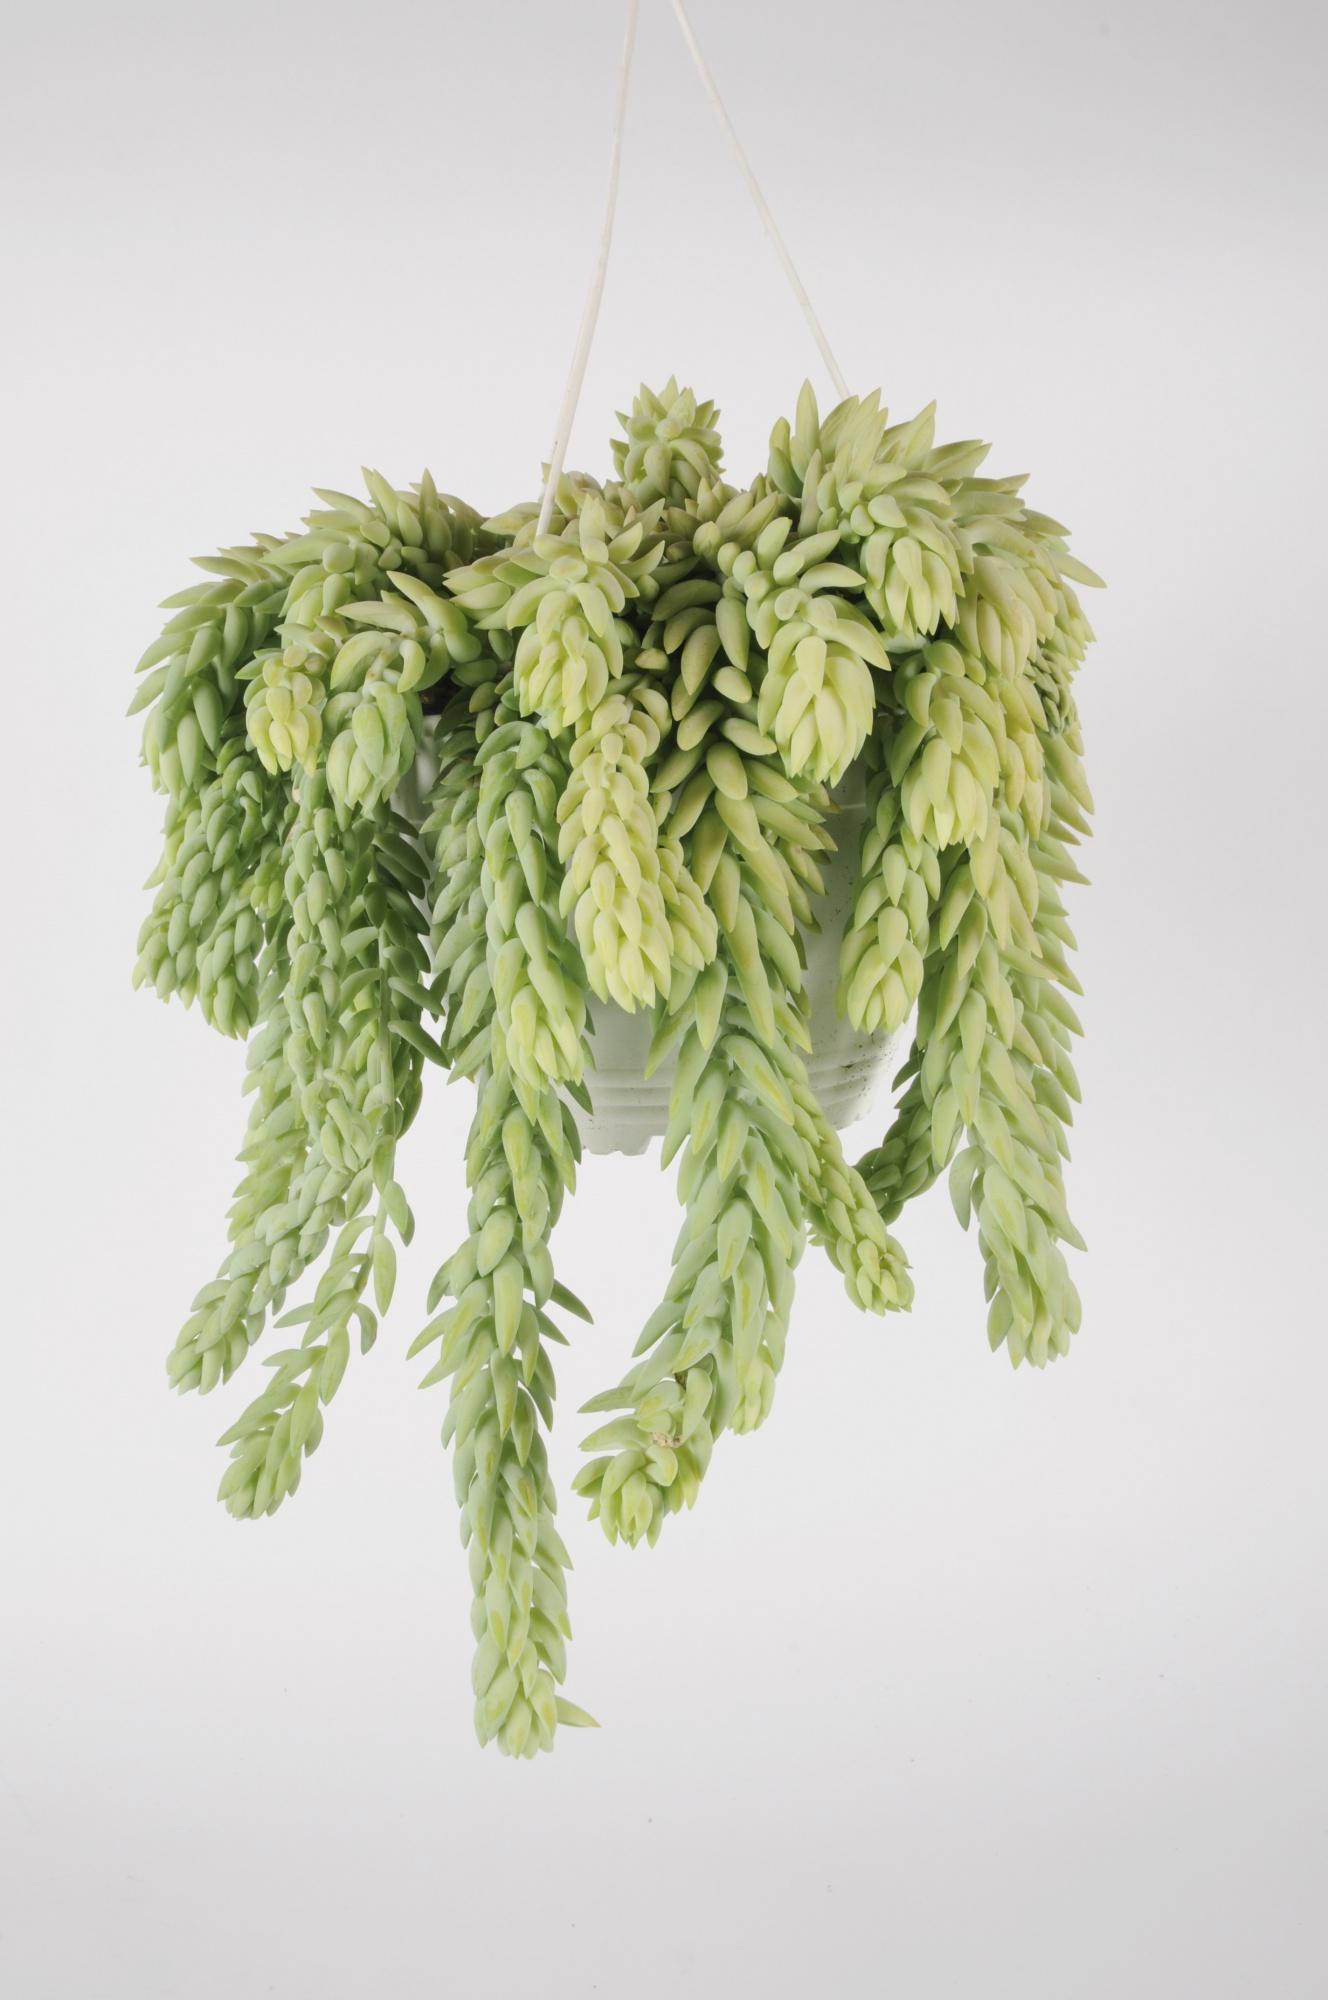 Sedum Morganianum 25cm x D19